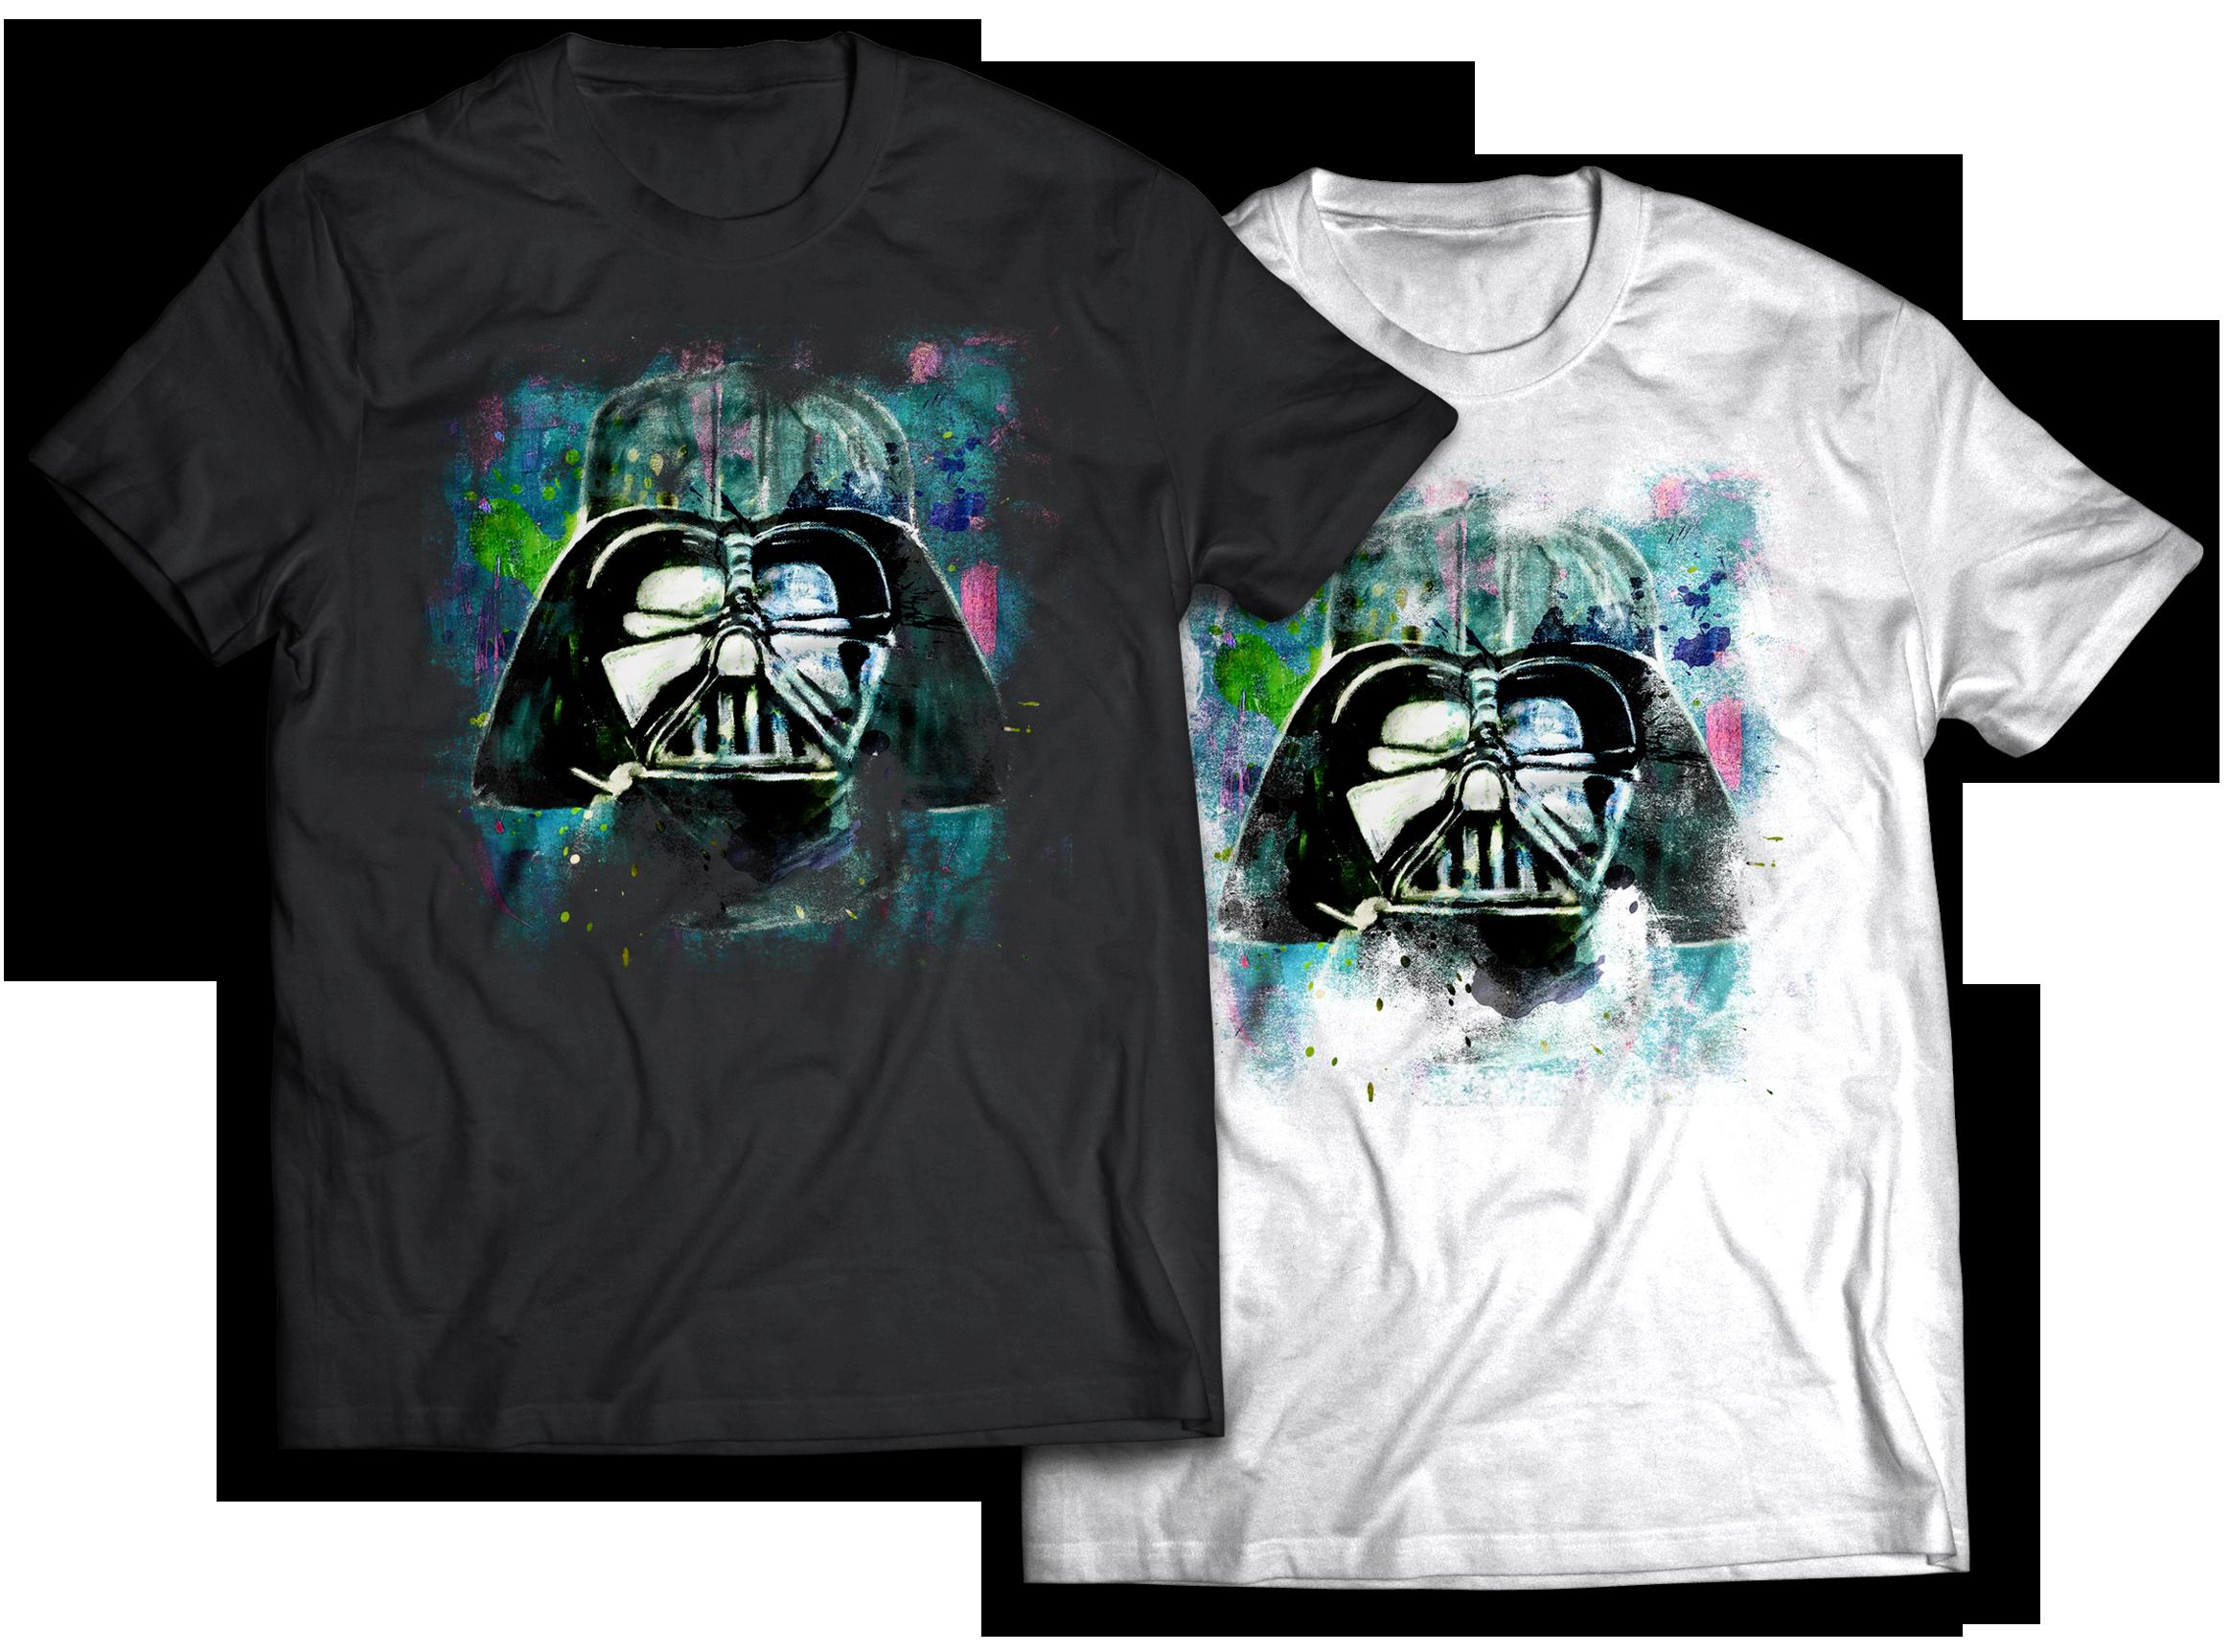 Darth Vader abstract painting t-shirt design Jlane Design Teepublic